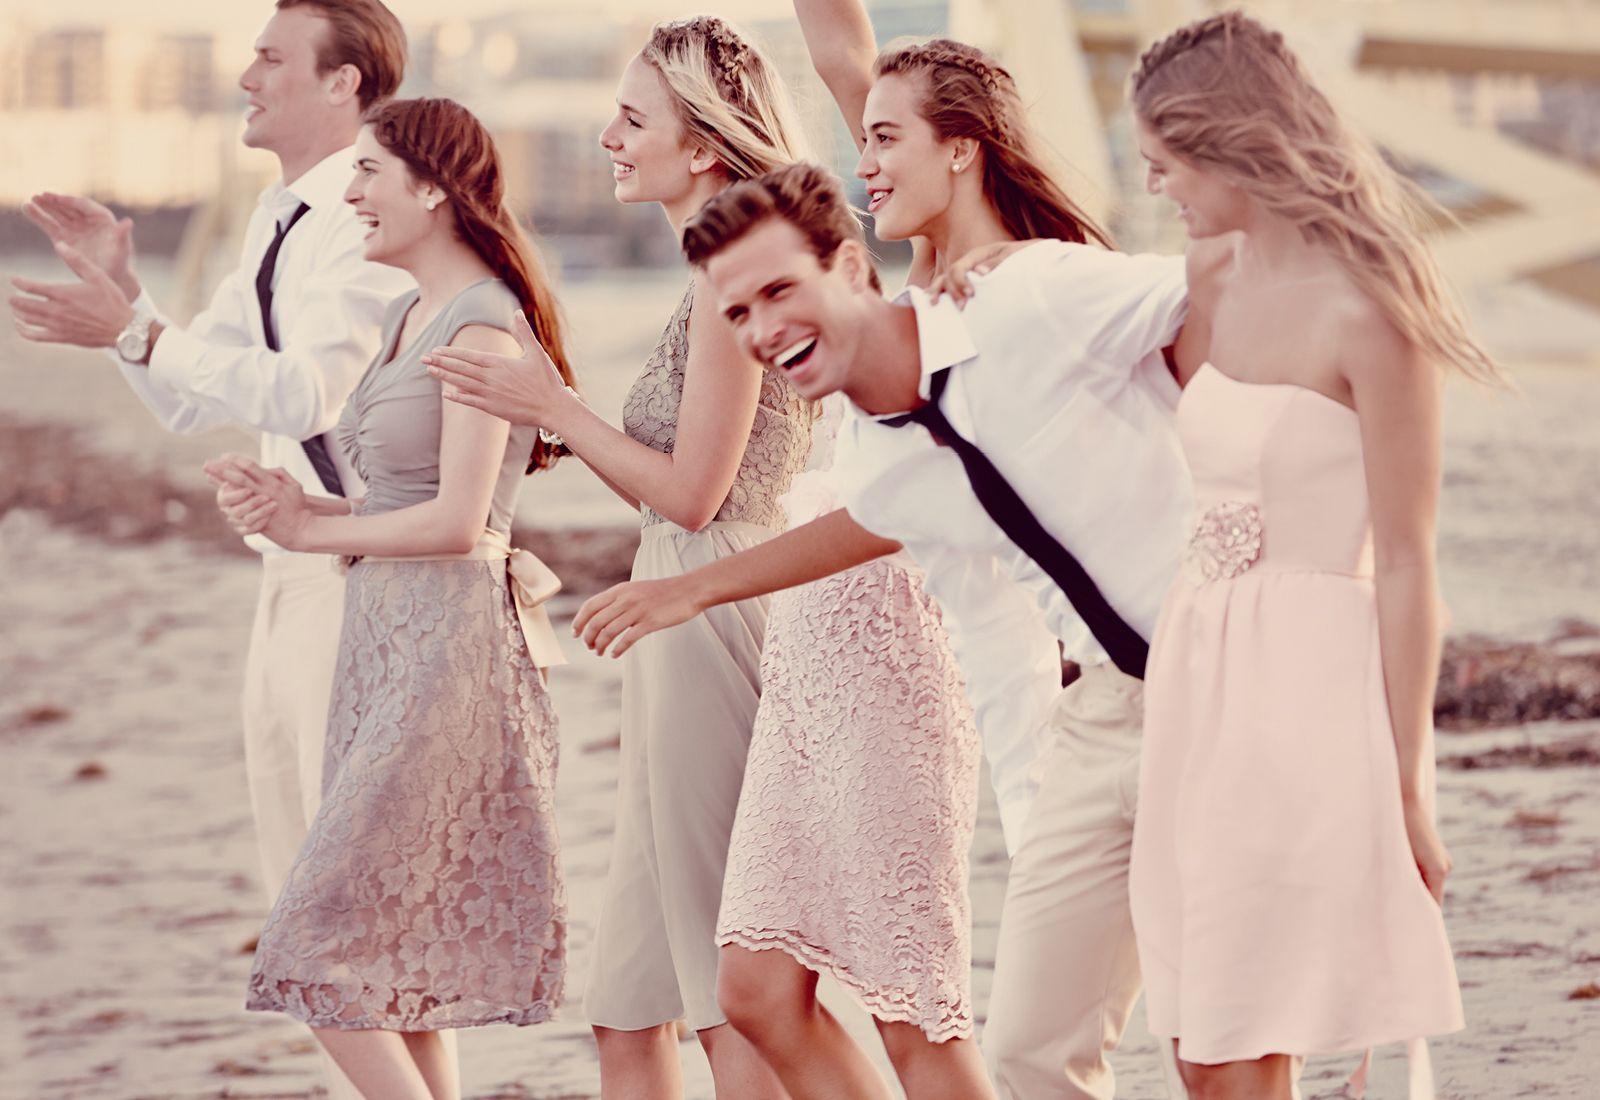 Shop for neutral bridesmaid looks, perfect for a #beachwedding #davidsbridal